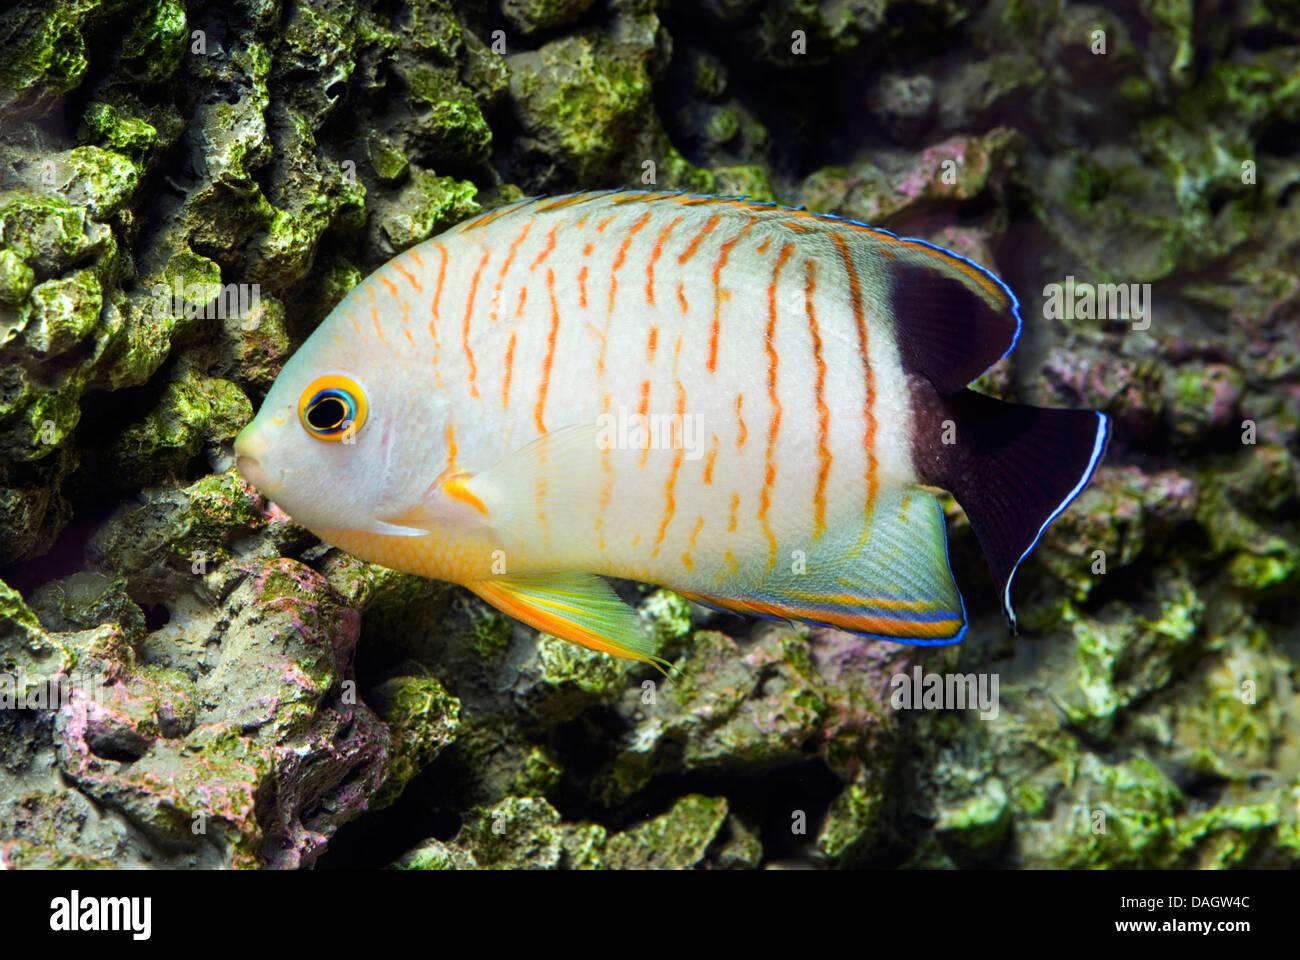 Blacktail angelfish (Centropyge eibli), swimming - Stock Image